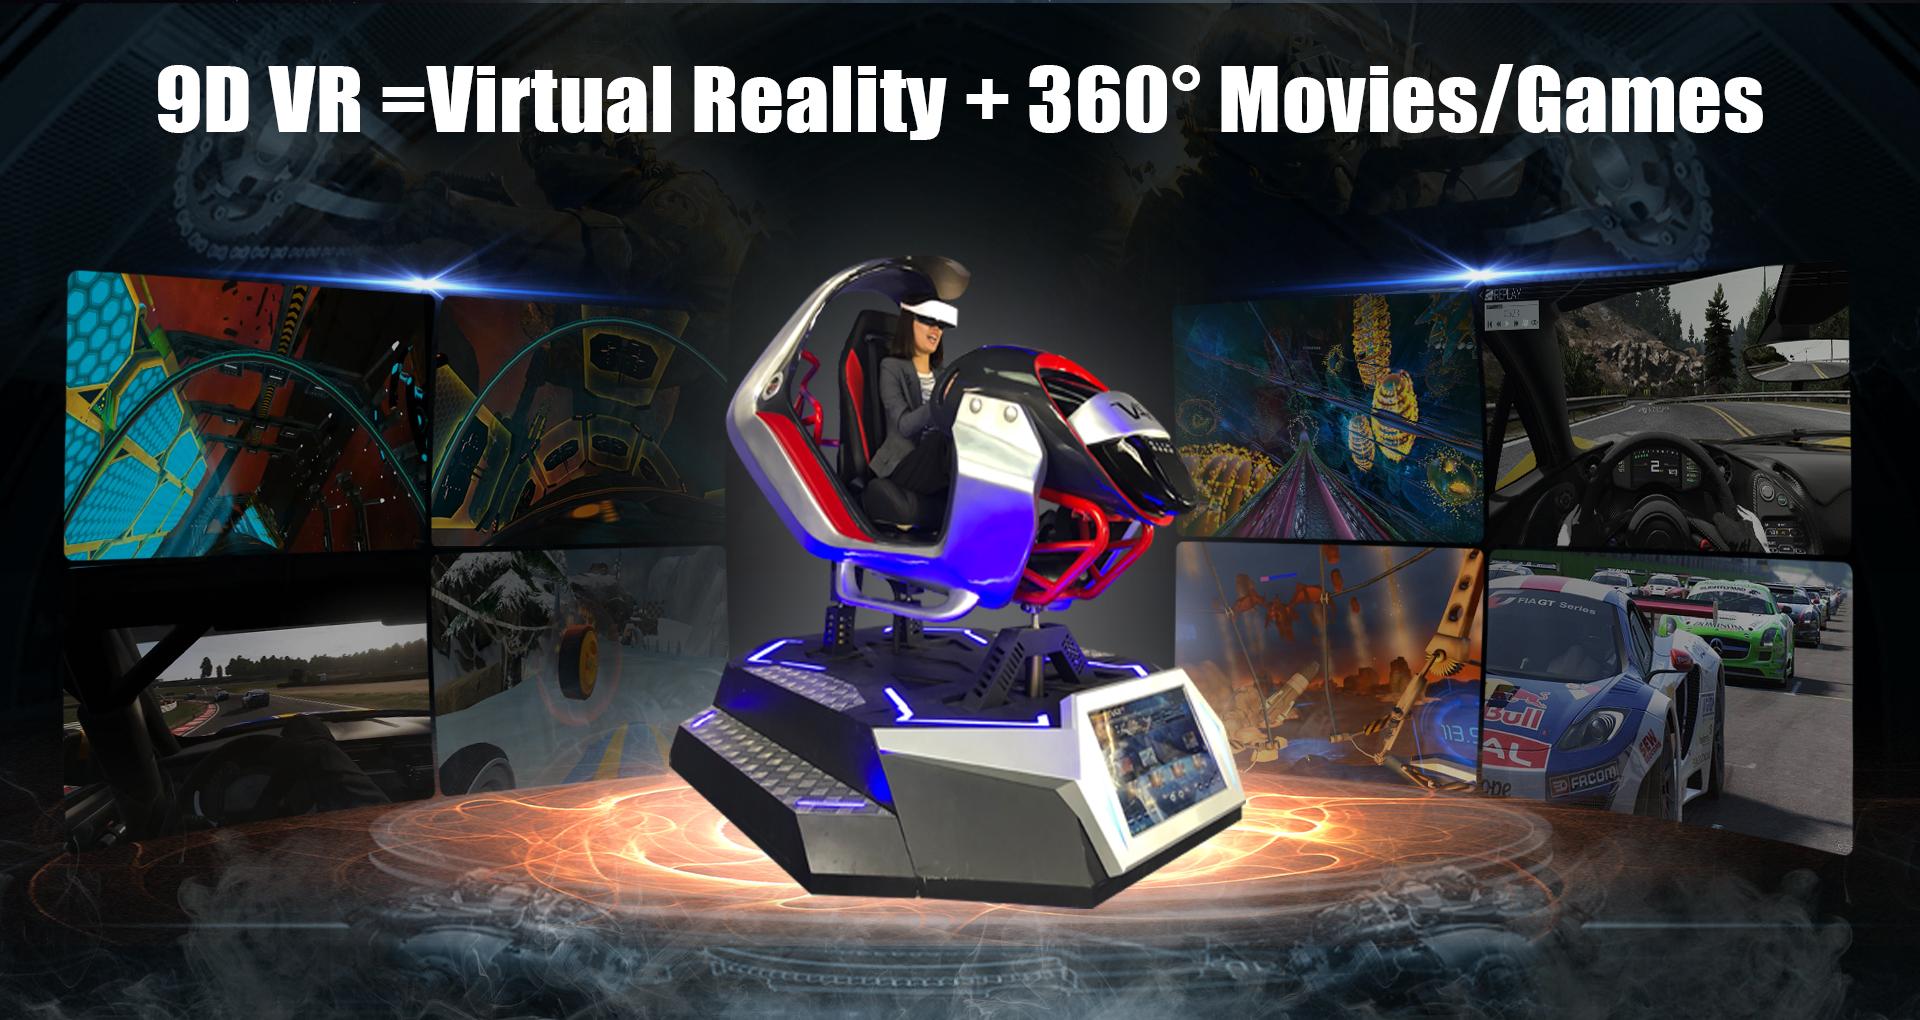 Adults Arcade Dynamic Car Racing Virtual Reality Driving Simulator Games  For Pc - Buy Car Racing Games For Pc,Virtual Reality Games Arcade,Adults